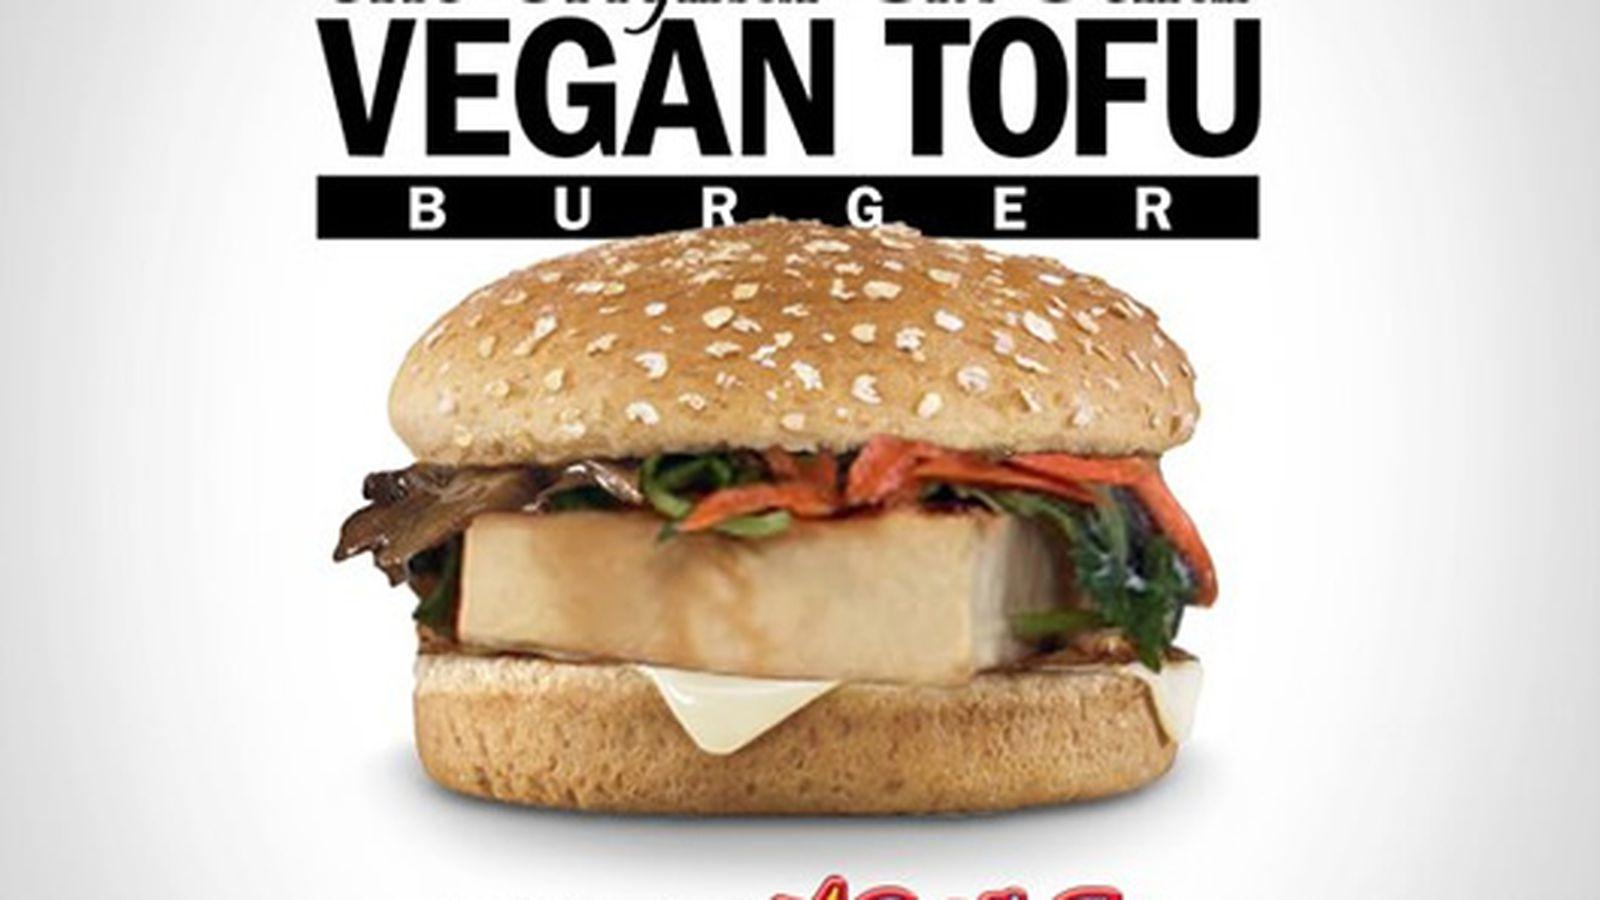 Carl's Jr Launches the Original Six Dollar Vegan Tofu Burger - Eater